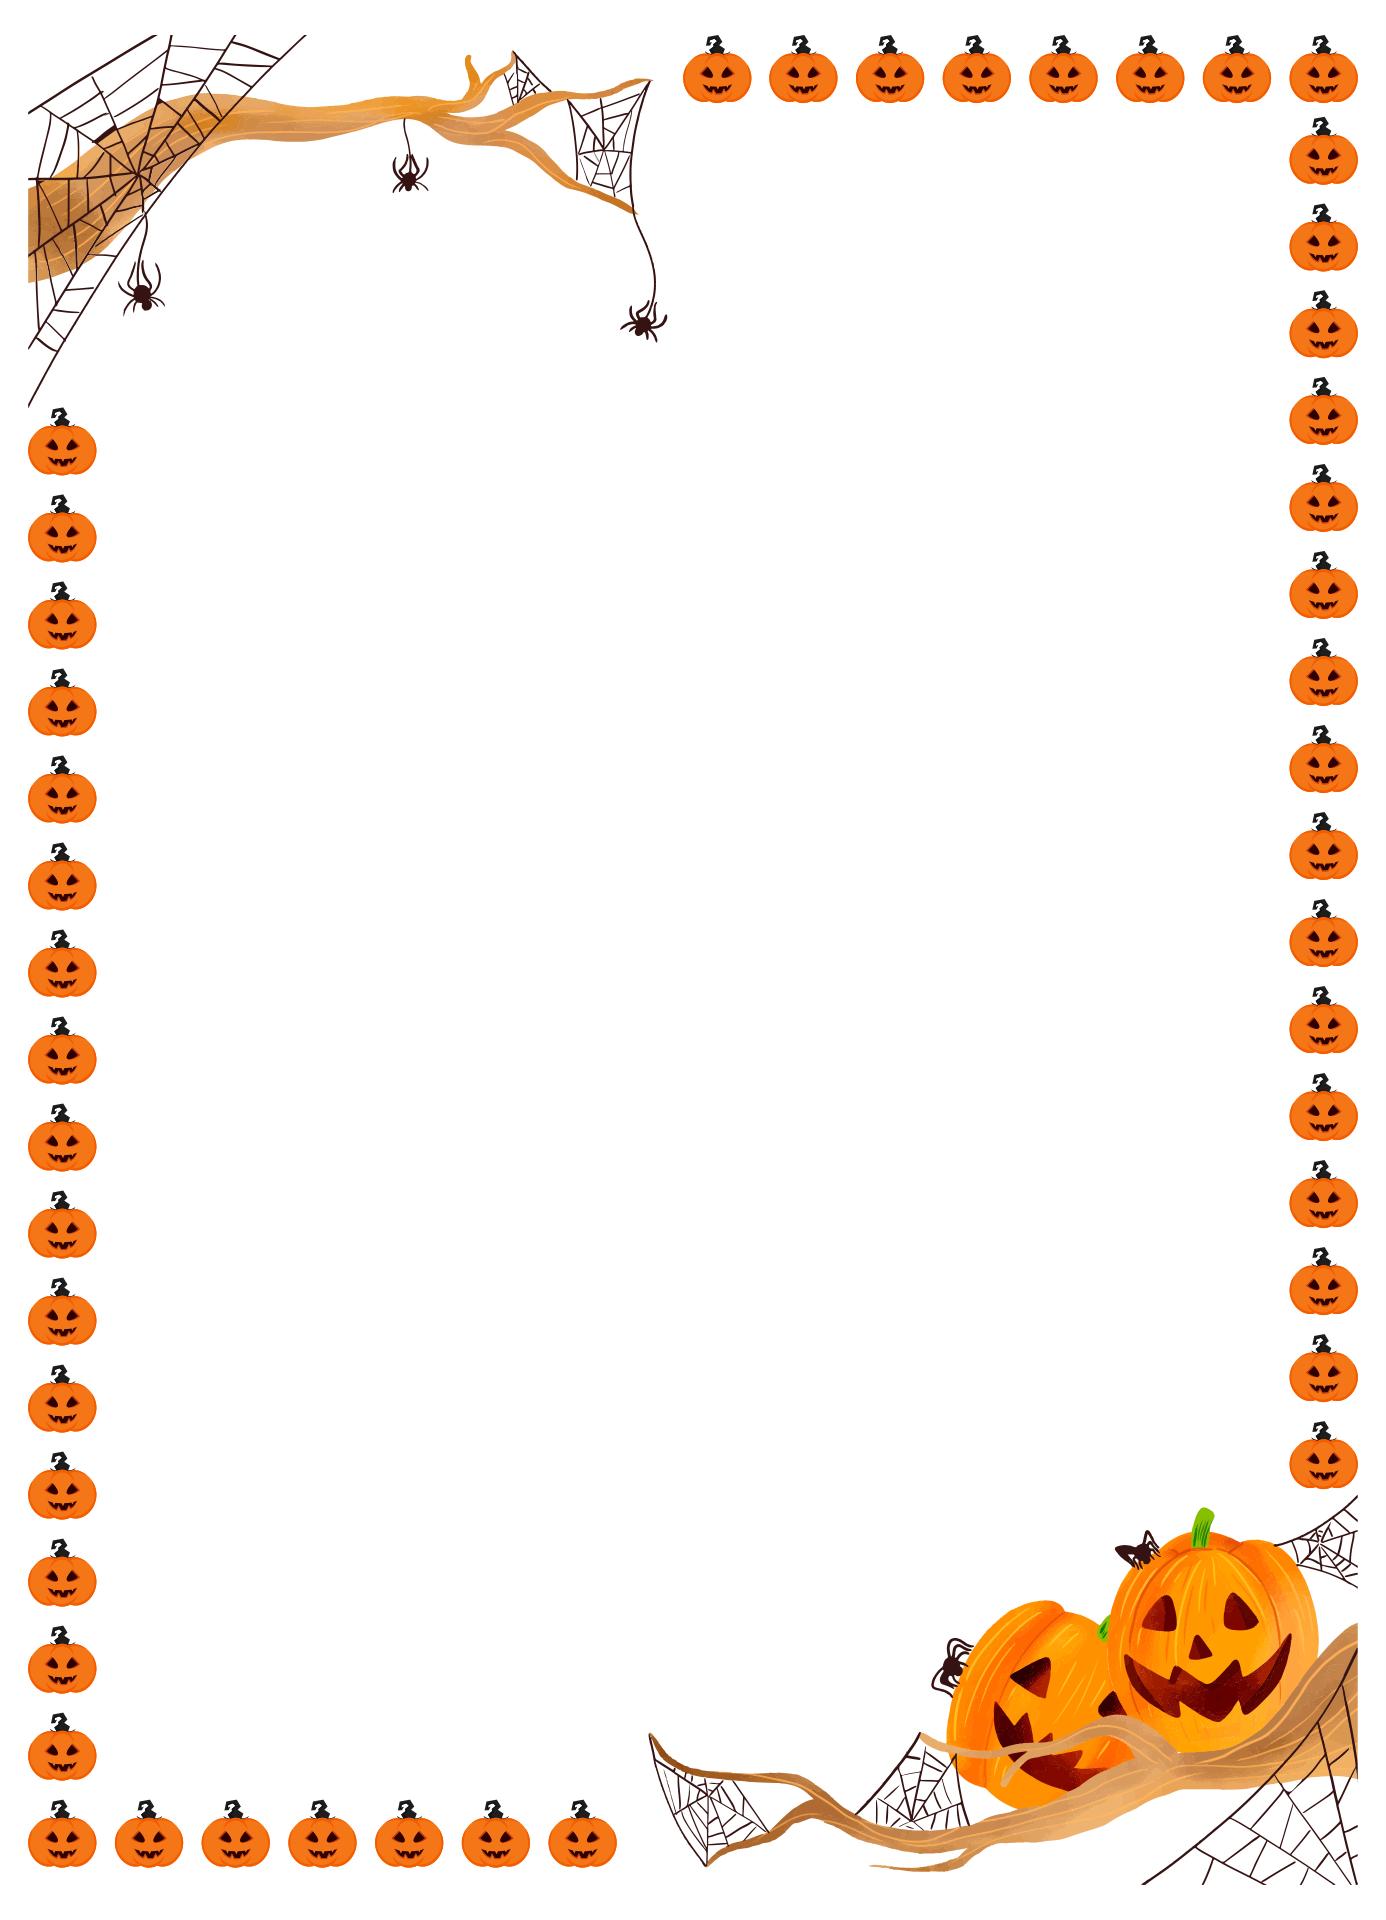 Free Printable Halloween Stationery Borders